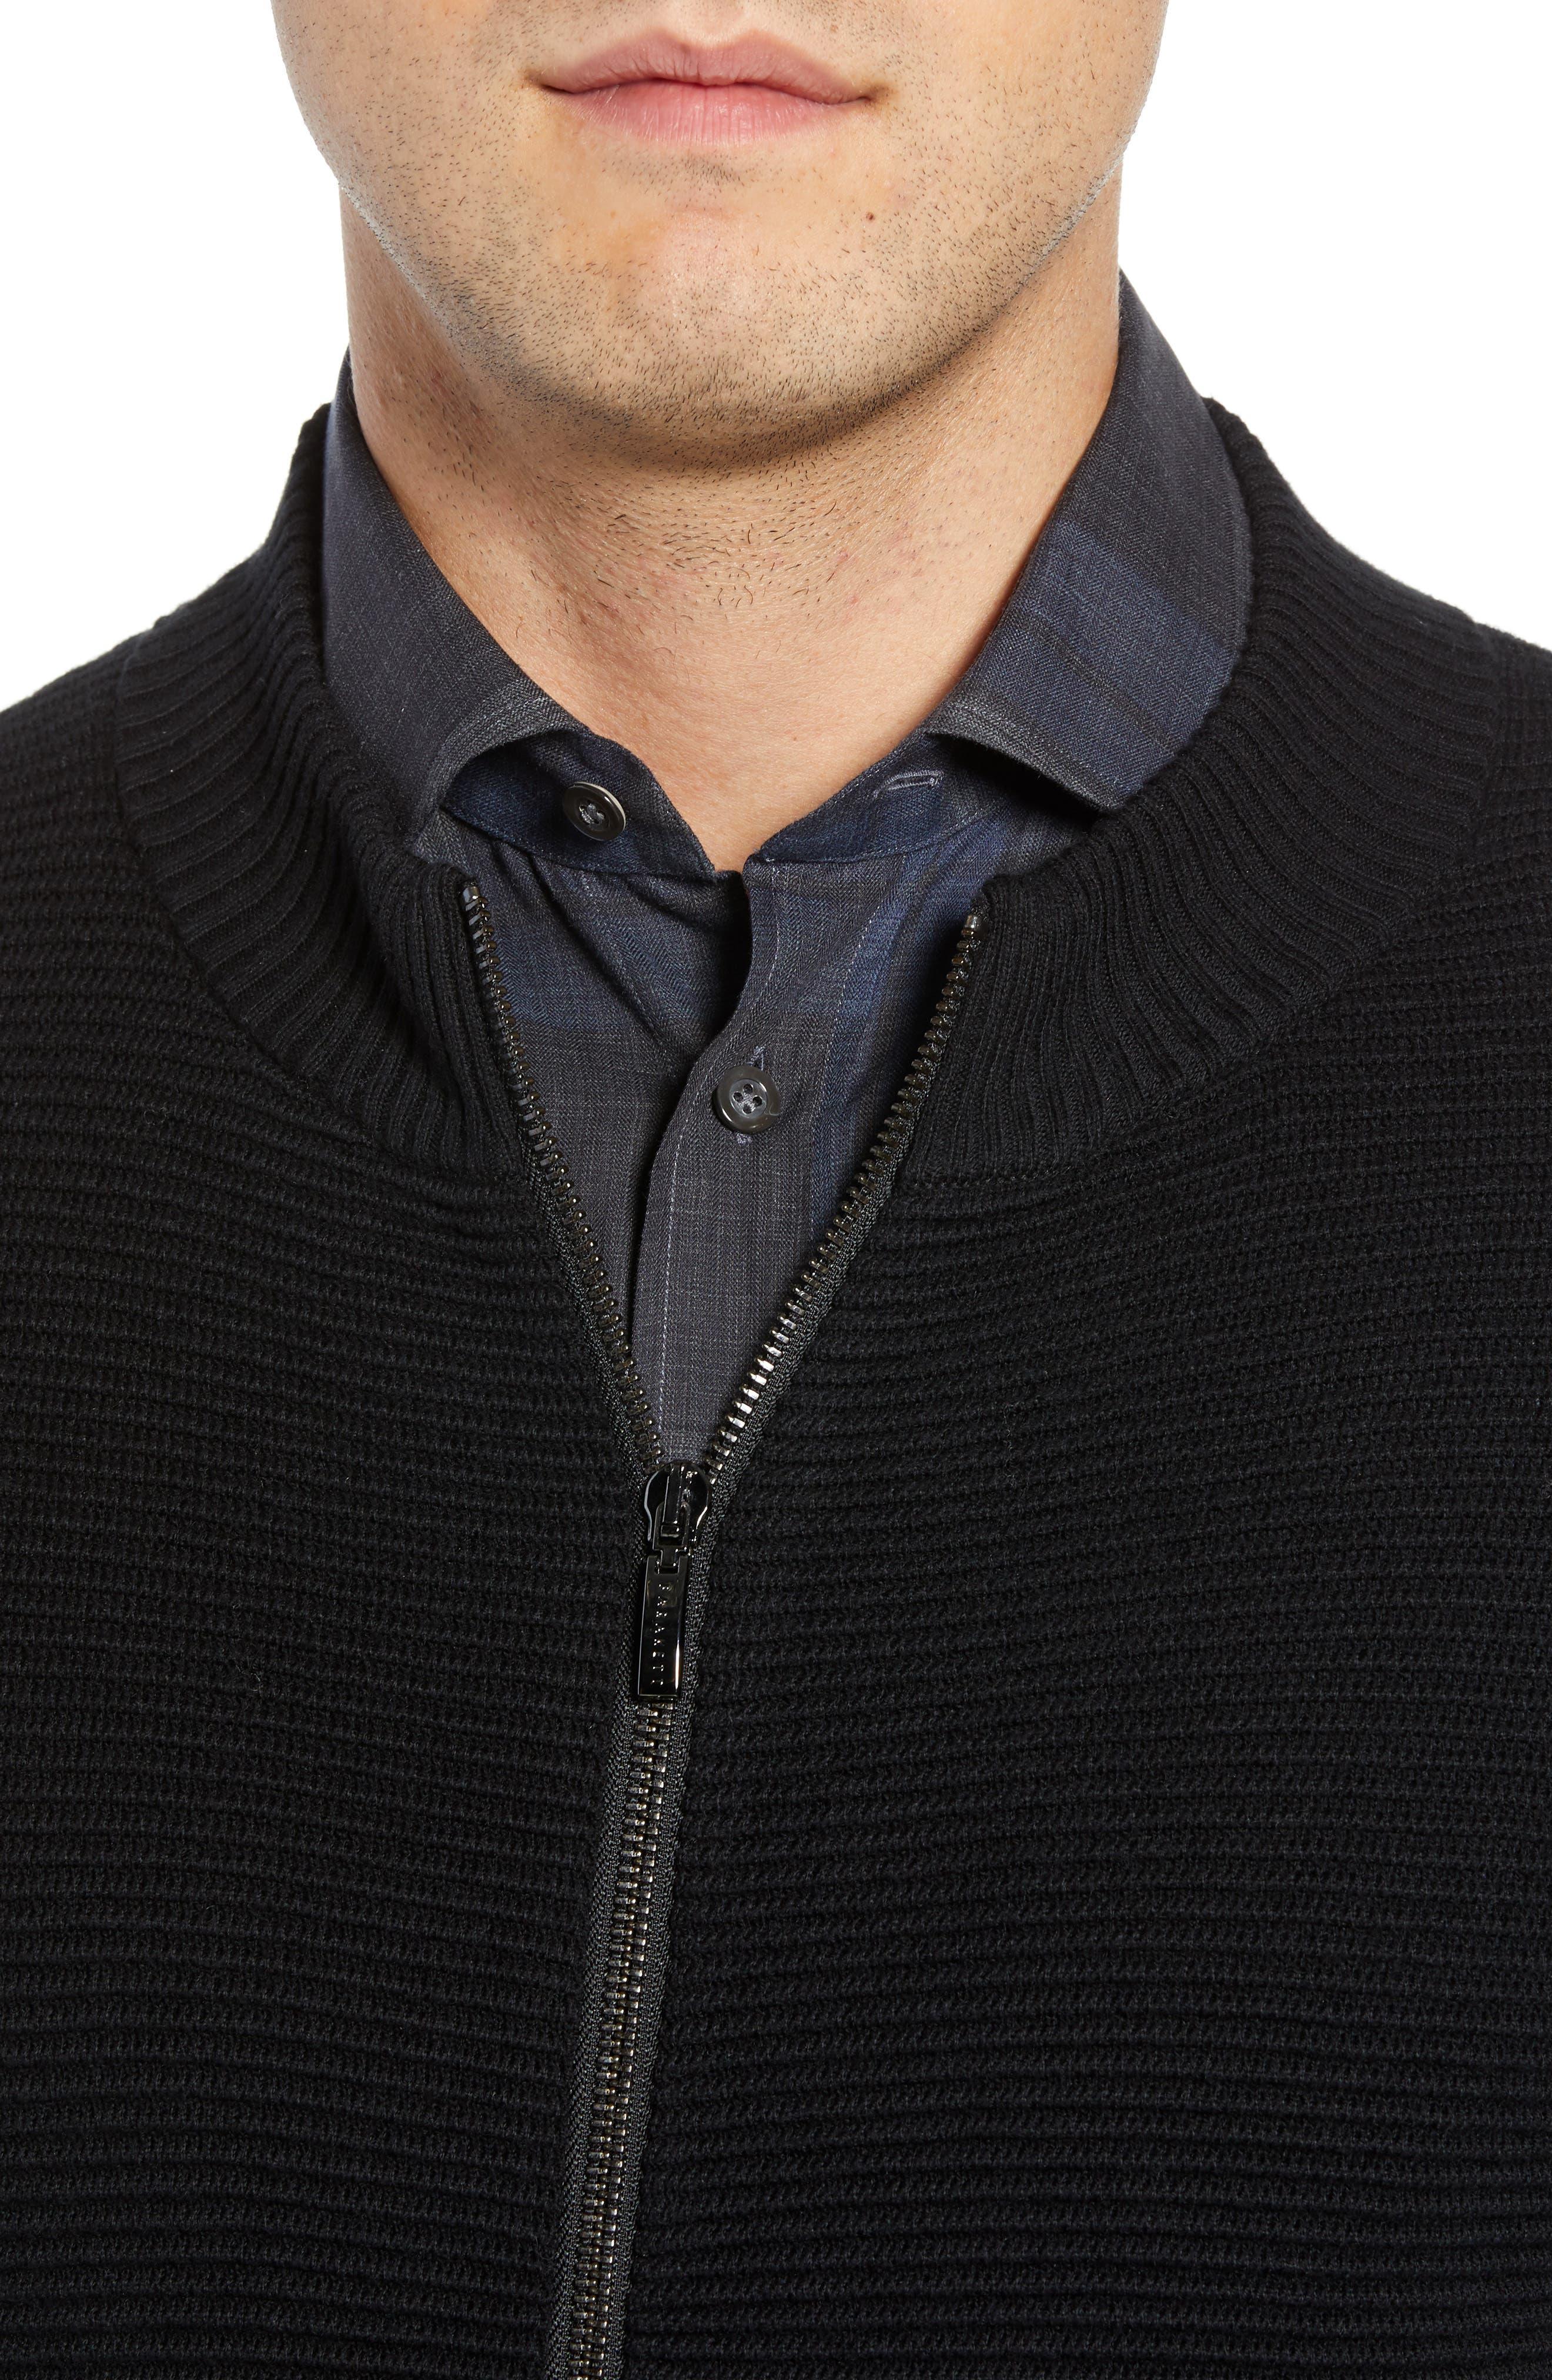 Yorkville Zip Sweater,                             Alternate thumbnail 4, color,                             BLACK